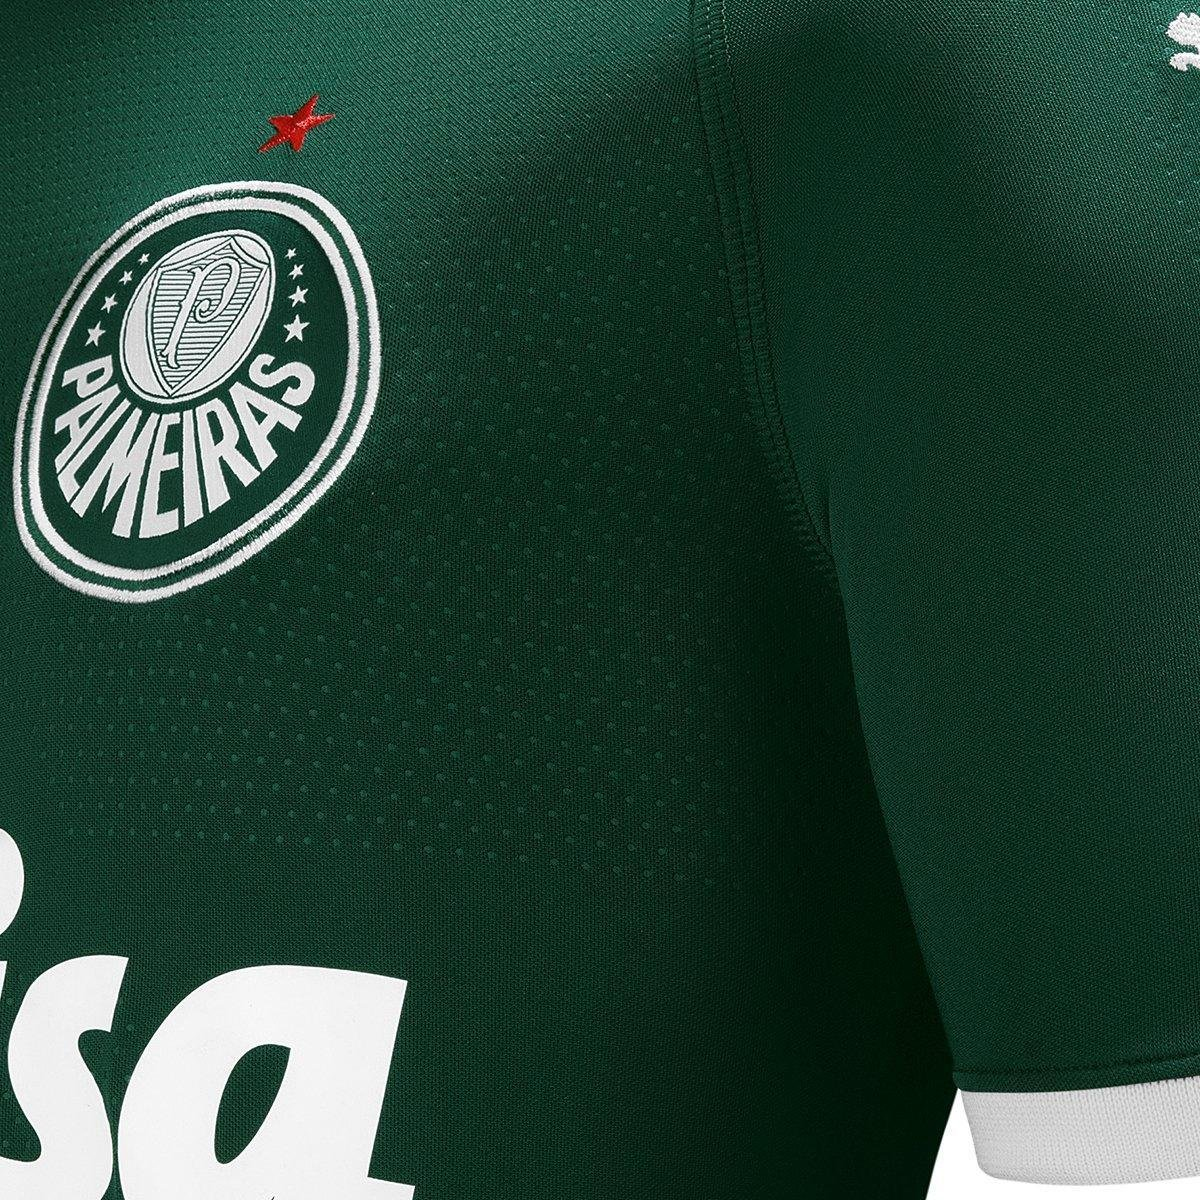 Camisa Palmeiras I 19/20 s/n° - Torcedor Puma Masculina - 2